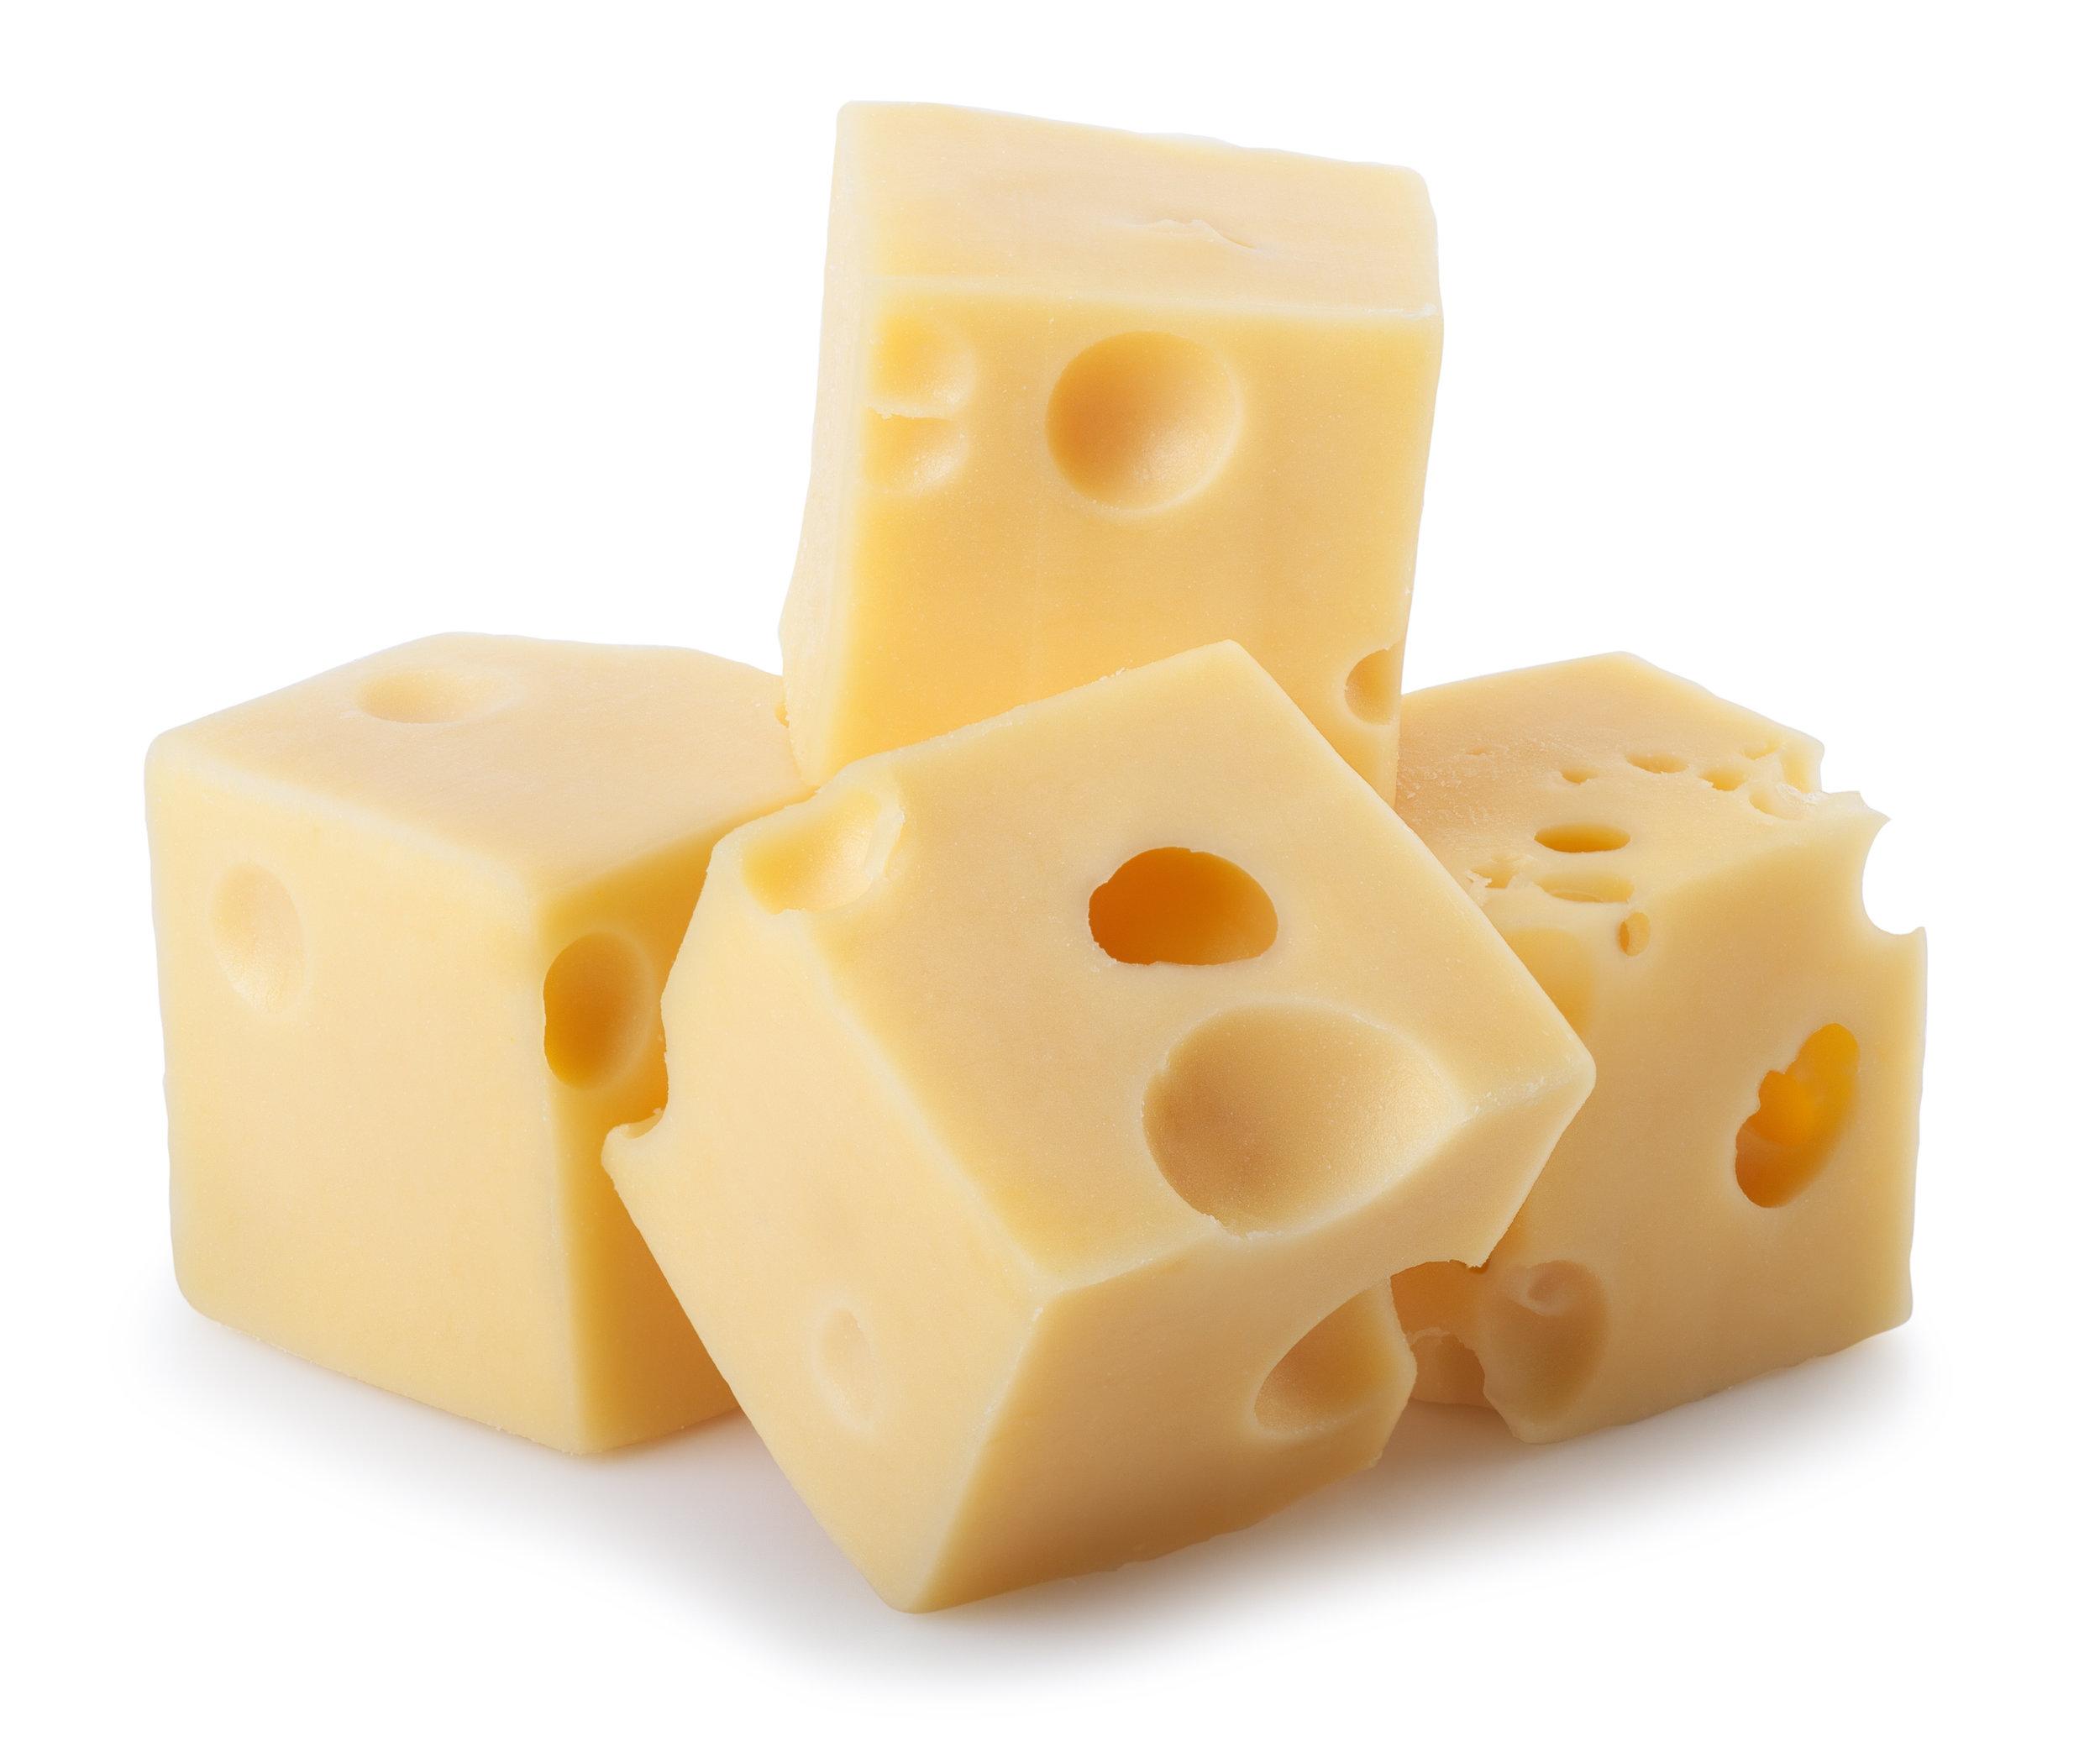 keto diet Cheese